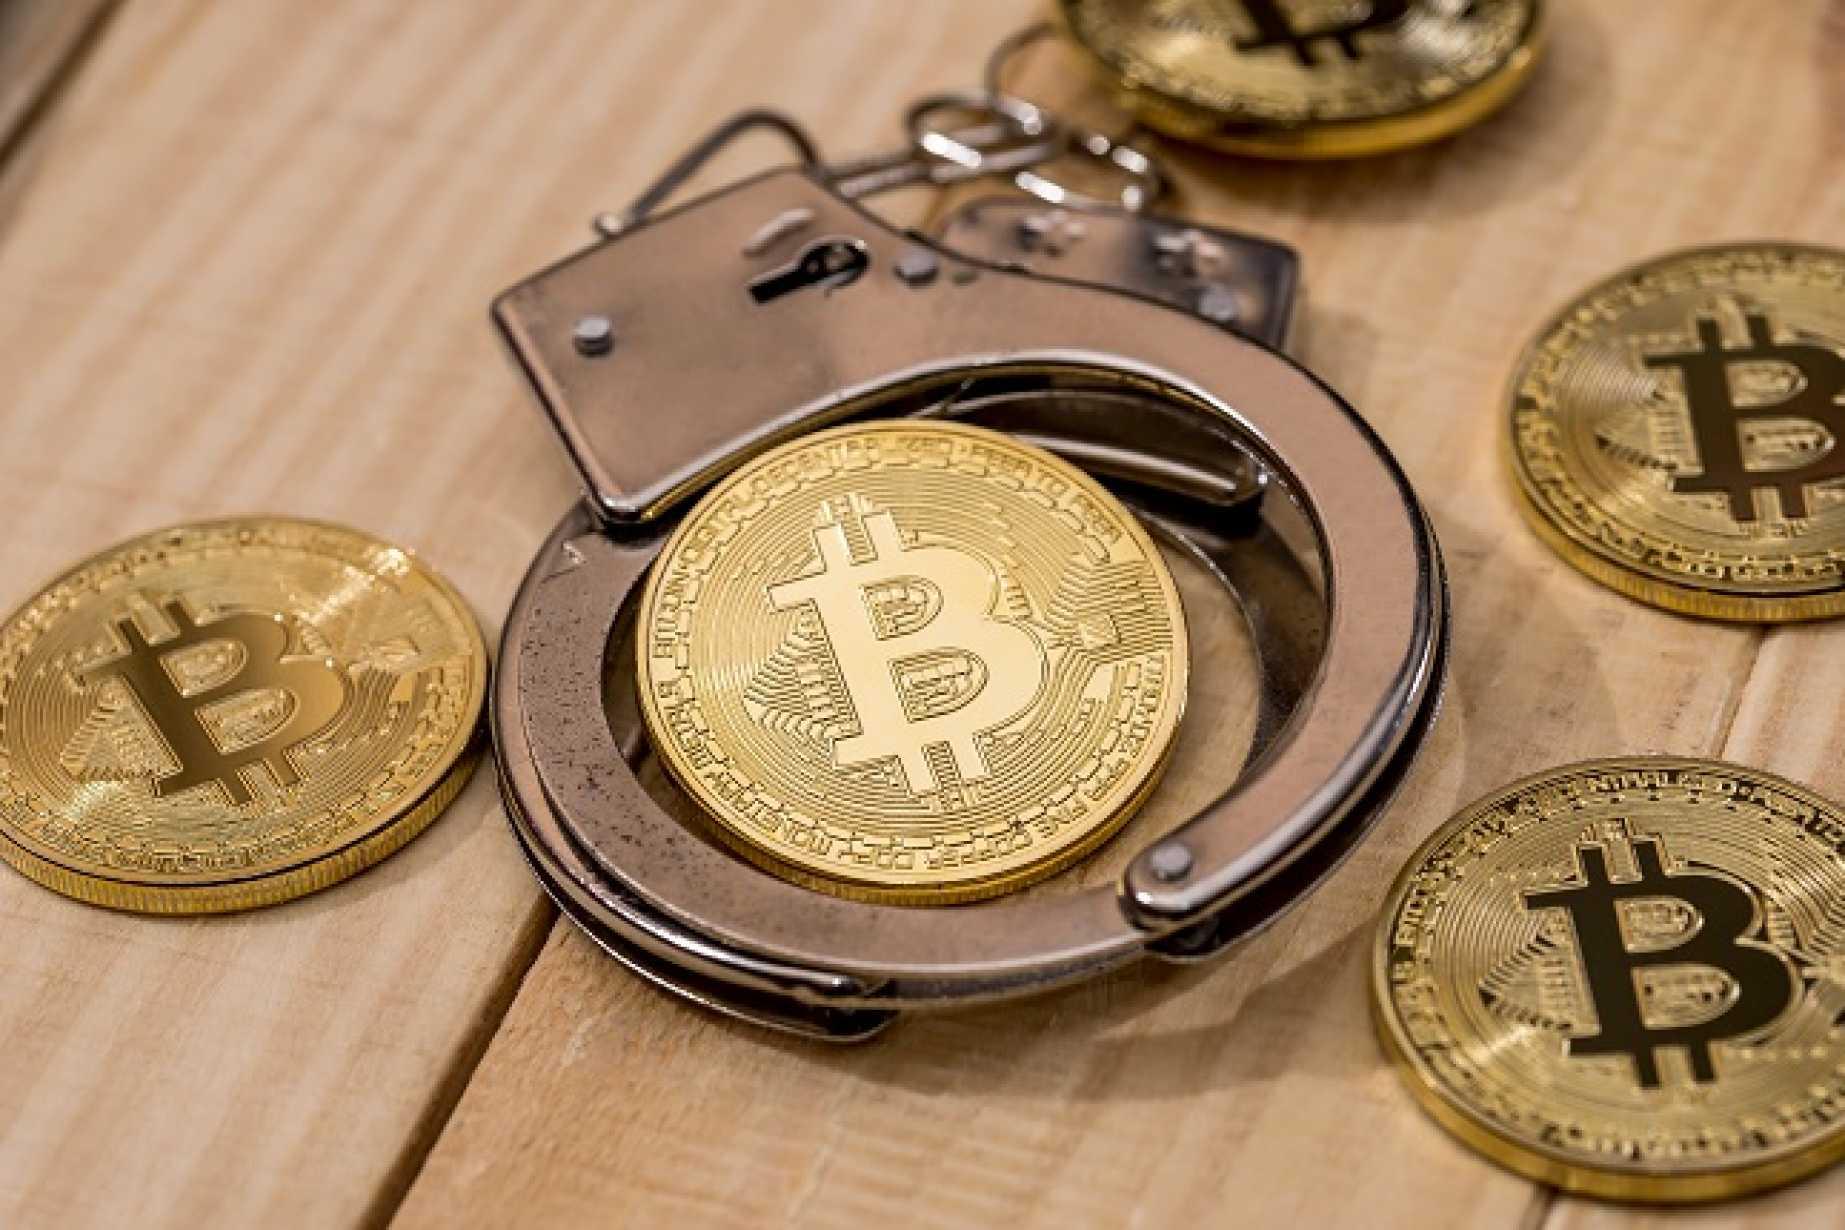 interpol bitcoin kılavuzu sızdırıldı